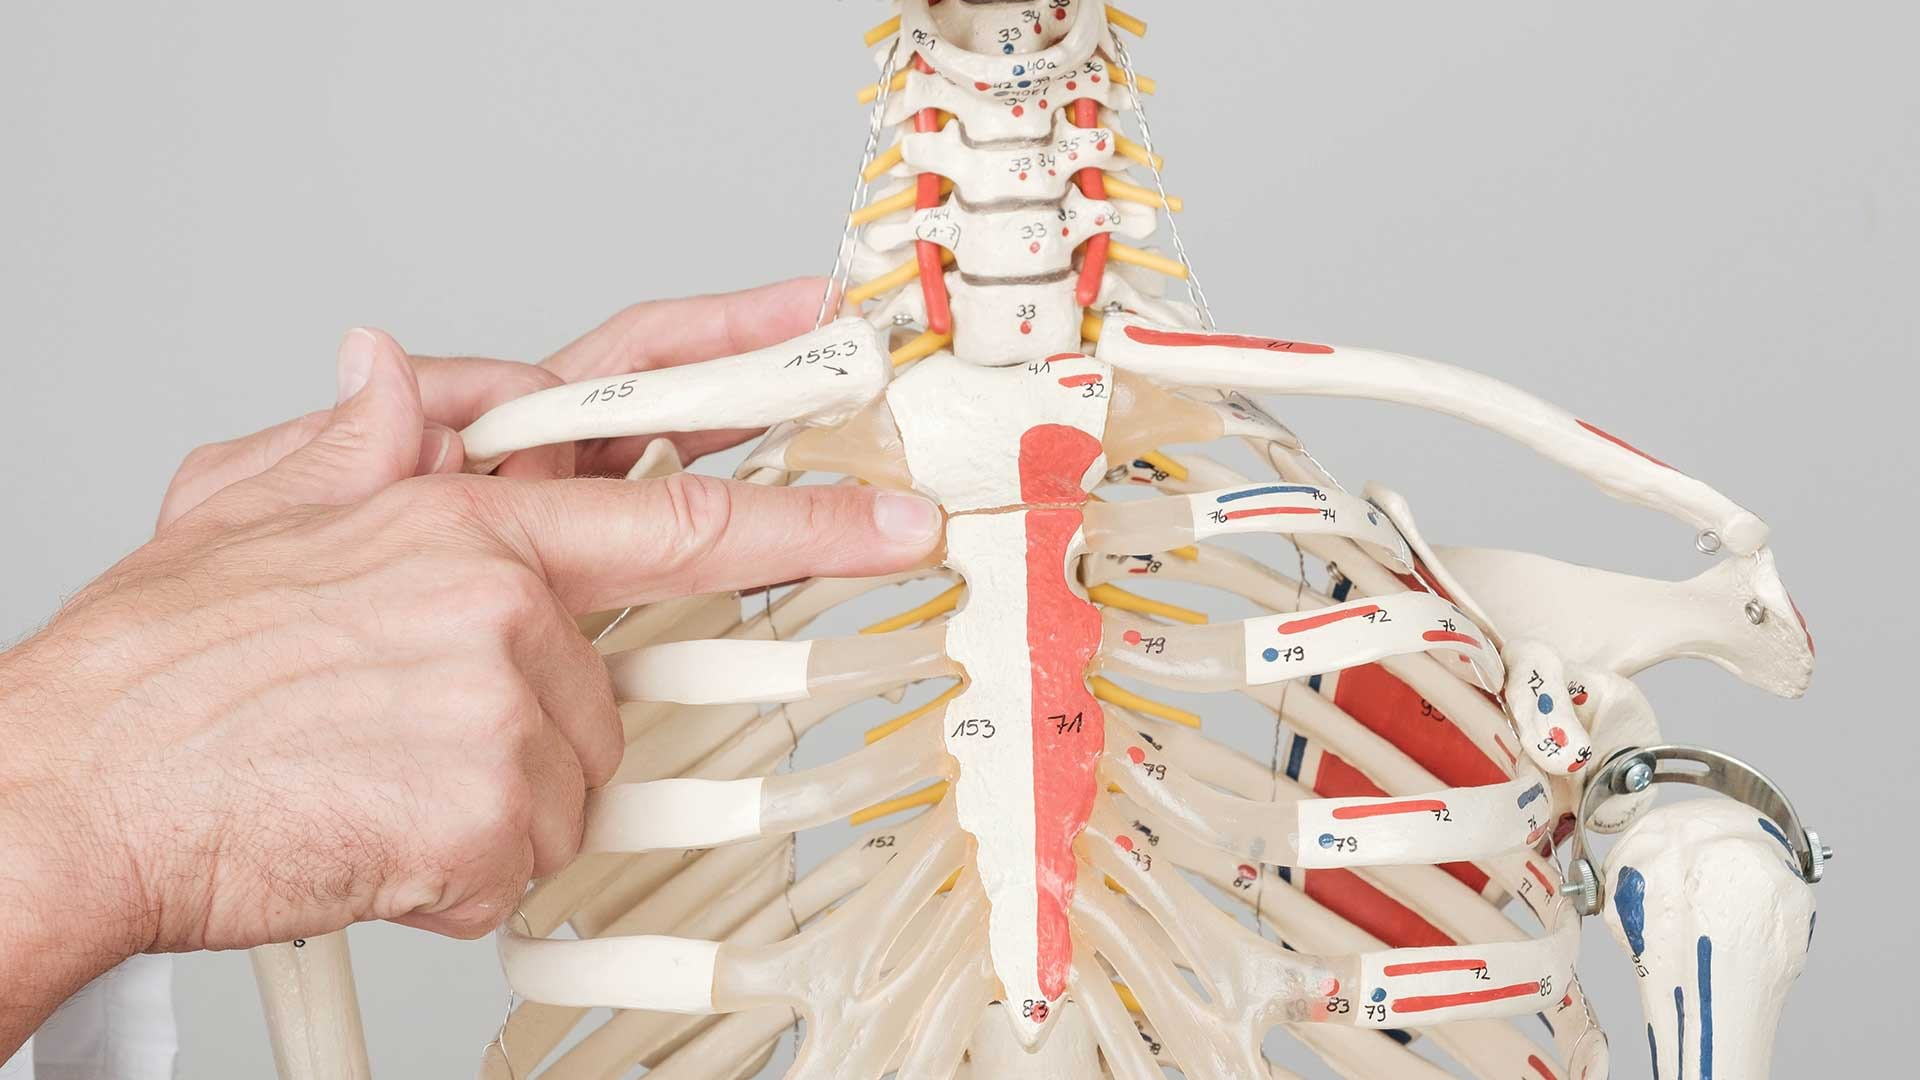 Bolesti-kostiju-i-hrskavice